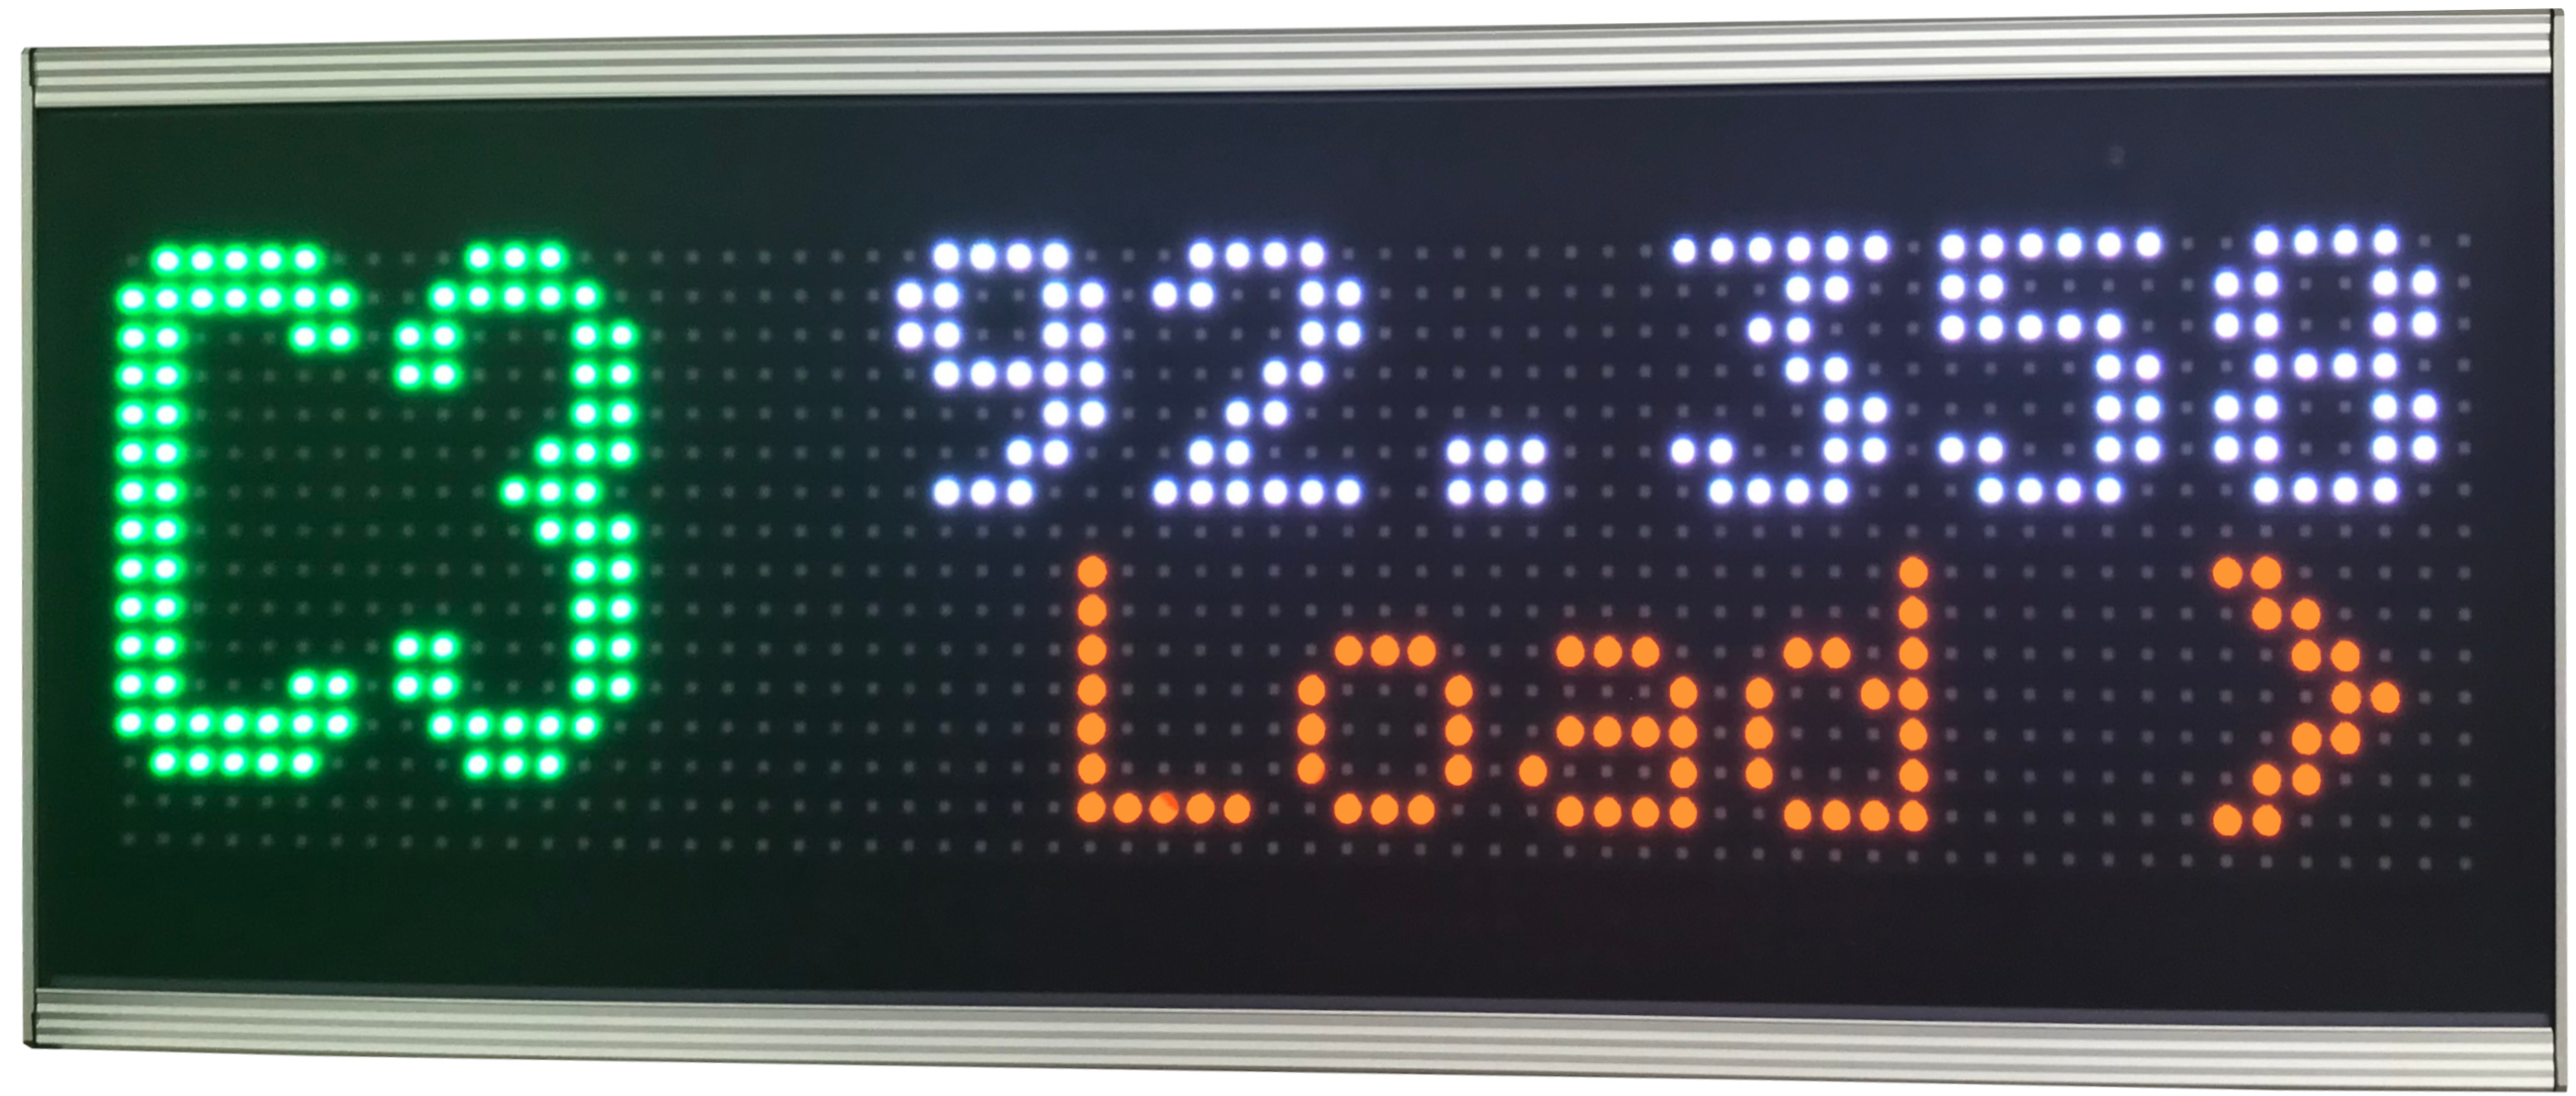 Maschinenüberwachungsanzeige, LED Matrix Display 16 x 64 LEDs, Pixelabstand 10 mm